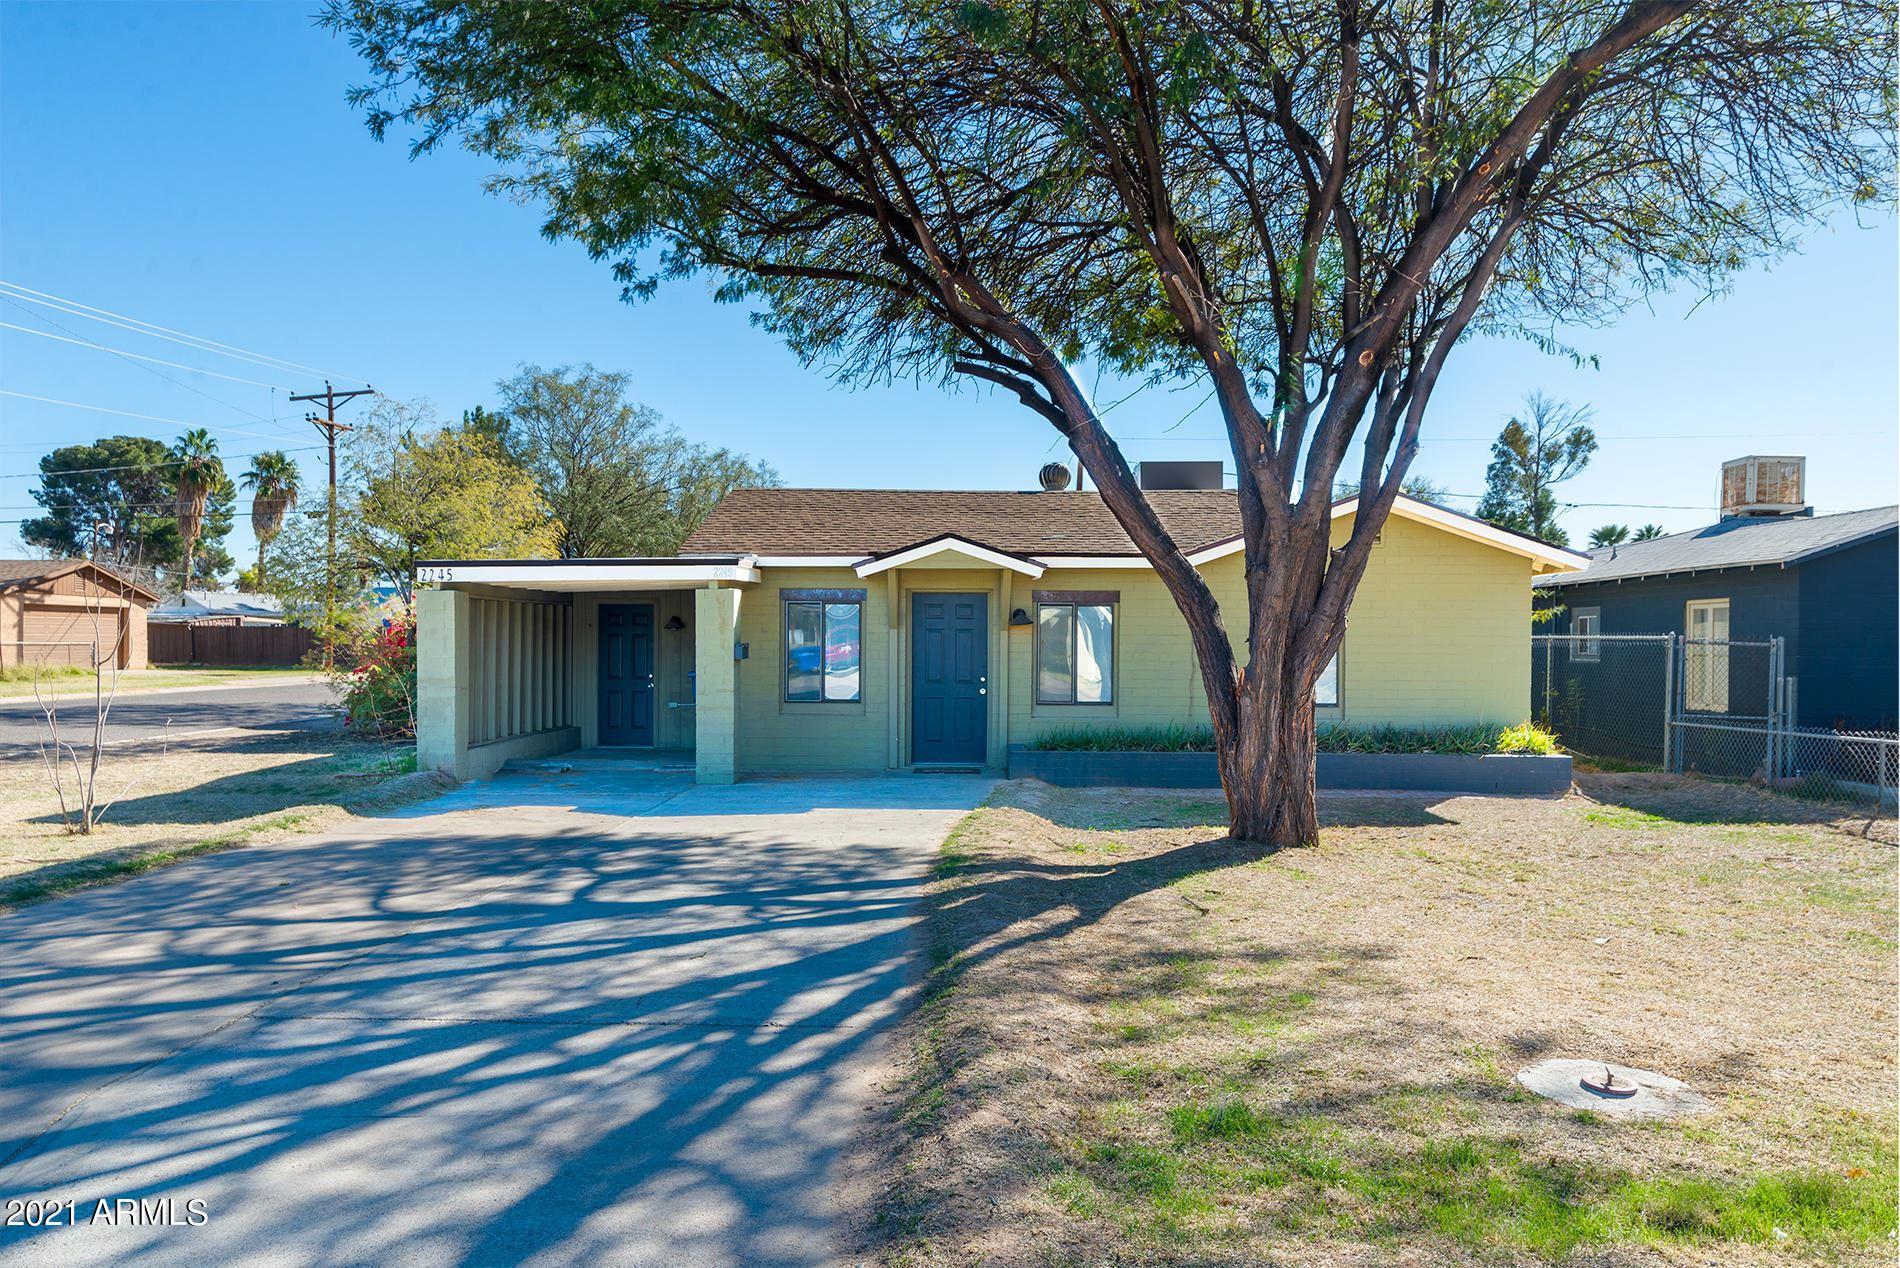 2245 E INDIANOLA Avenue, Phoenix, AZ 85016 - MLS#: 6196825